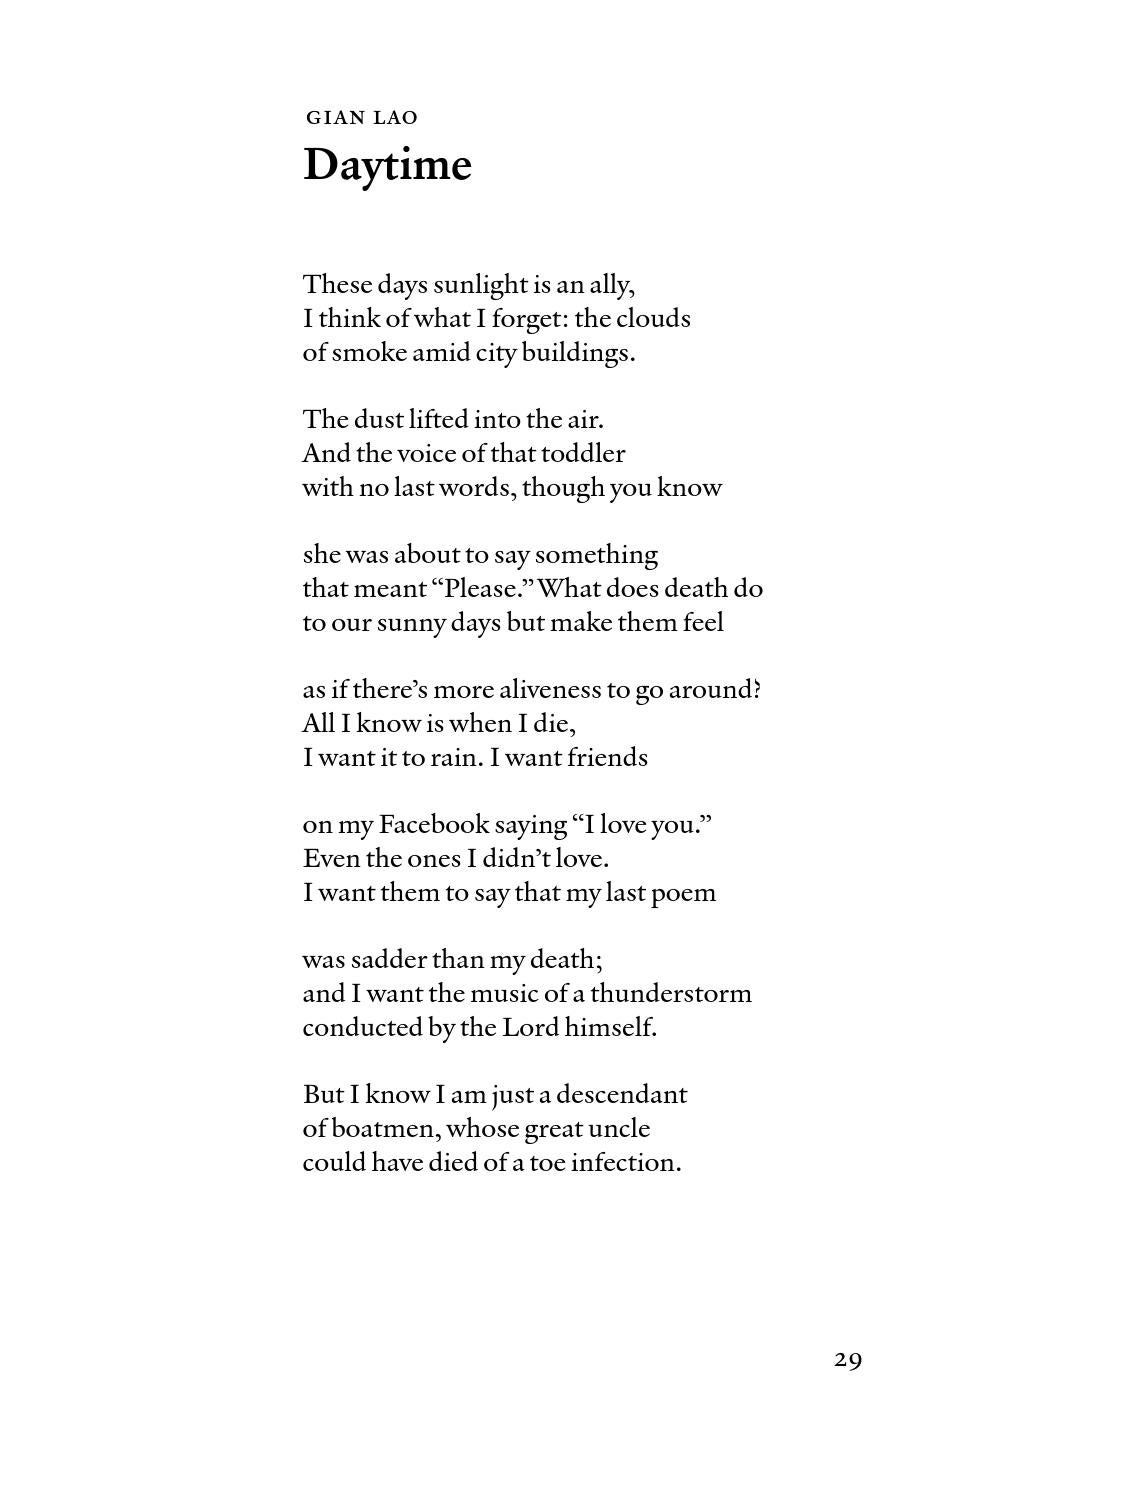 2013) Vol  61, No  1 by Heights Ateneo - issuu